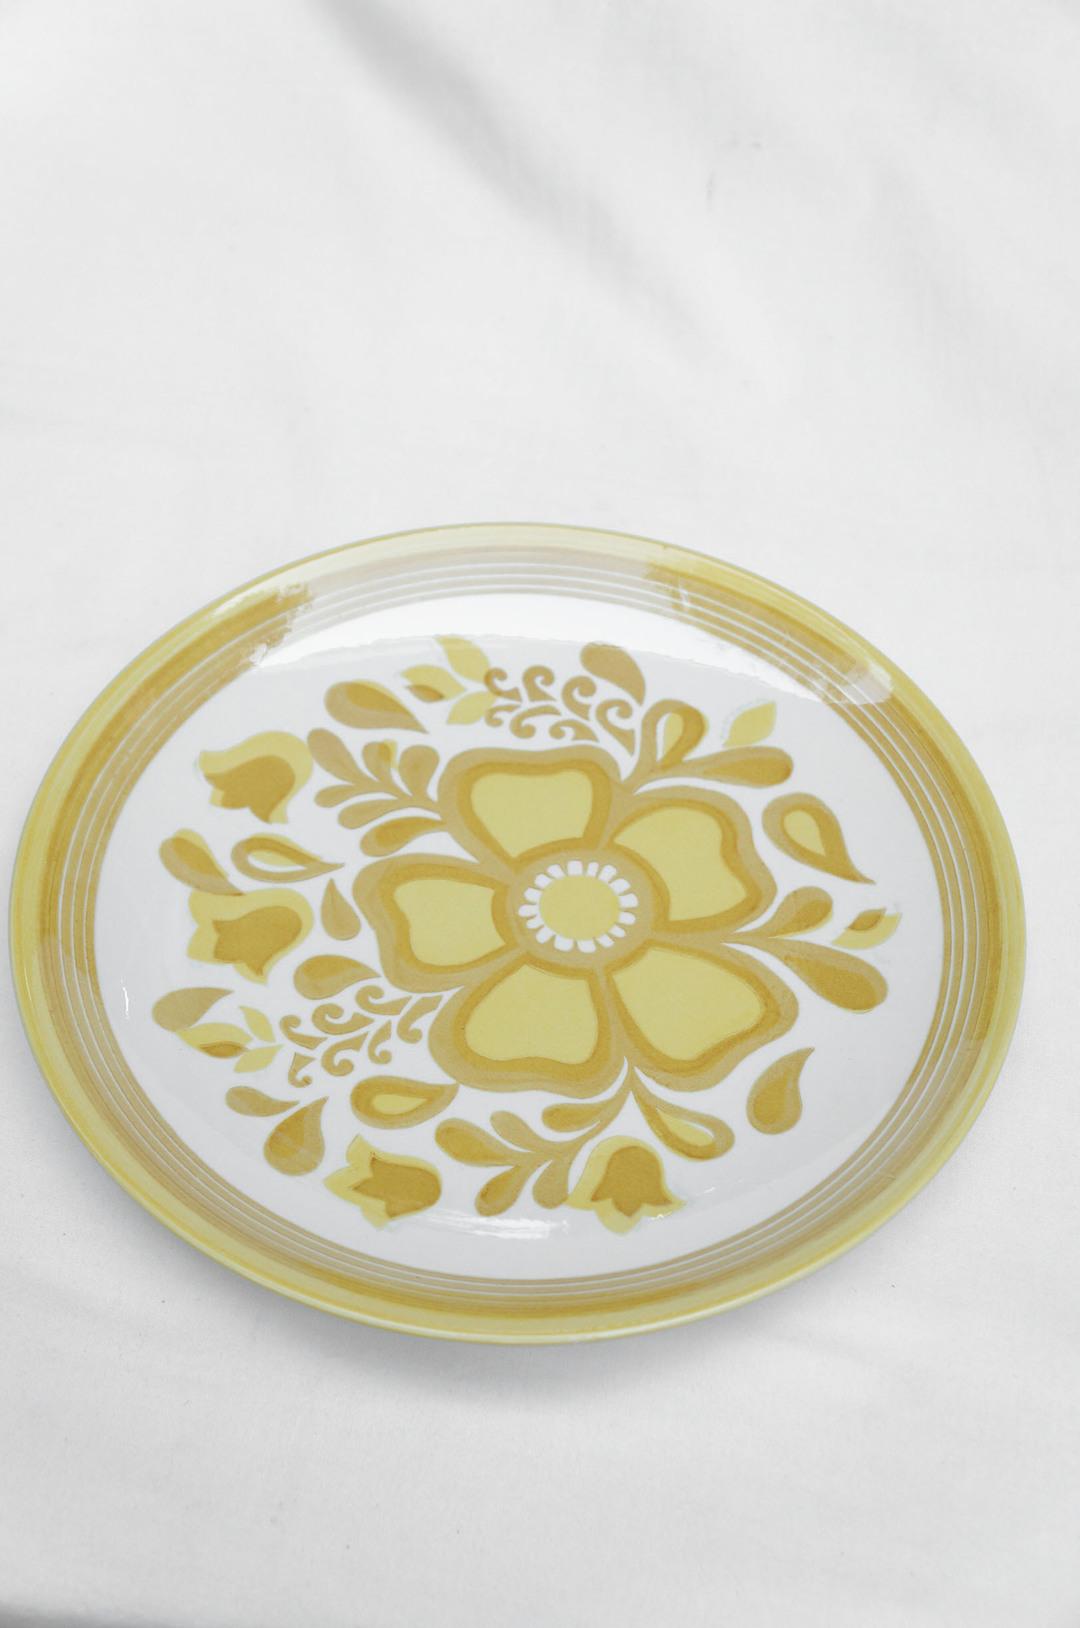 US Vintage Royal China Damsel Dinner Plate/アメリカ ヴィンテージ ロイヤルチャイナ ダムセル ディナープレート 食器 レトロ 2